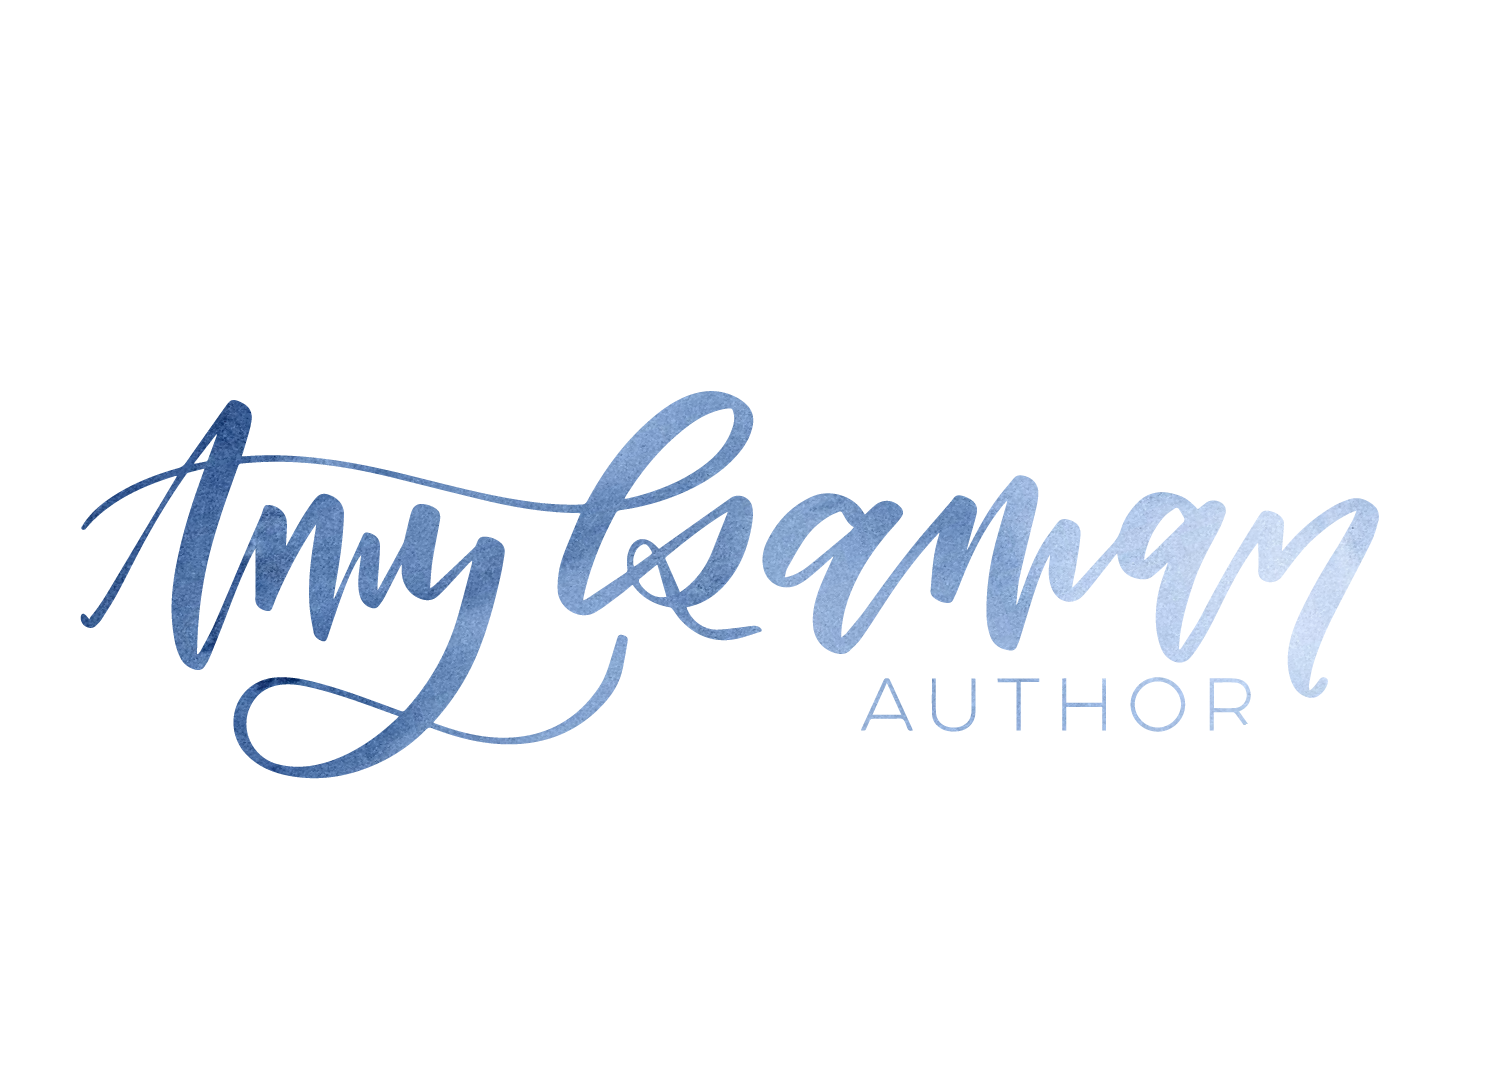 Amy Isaman